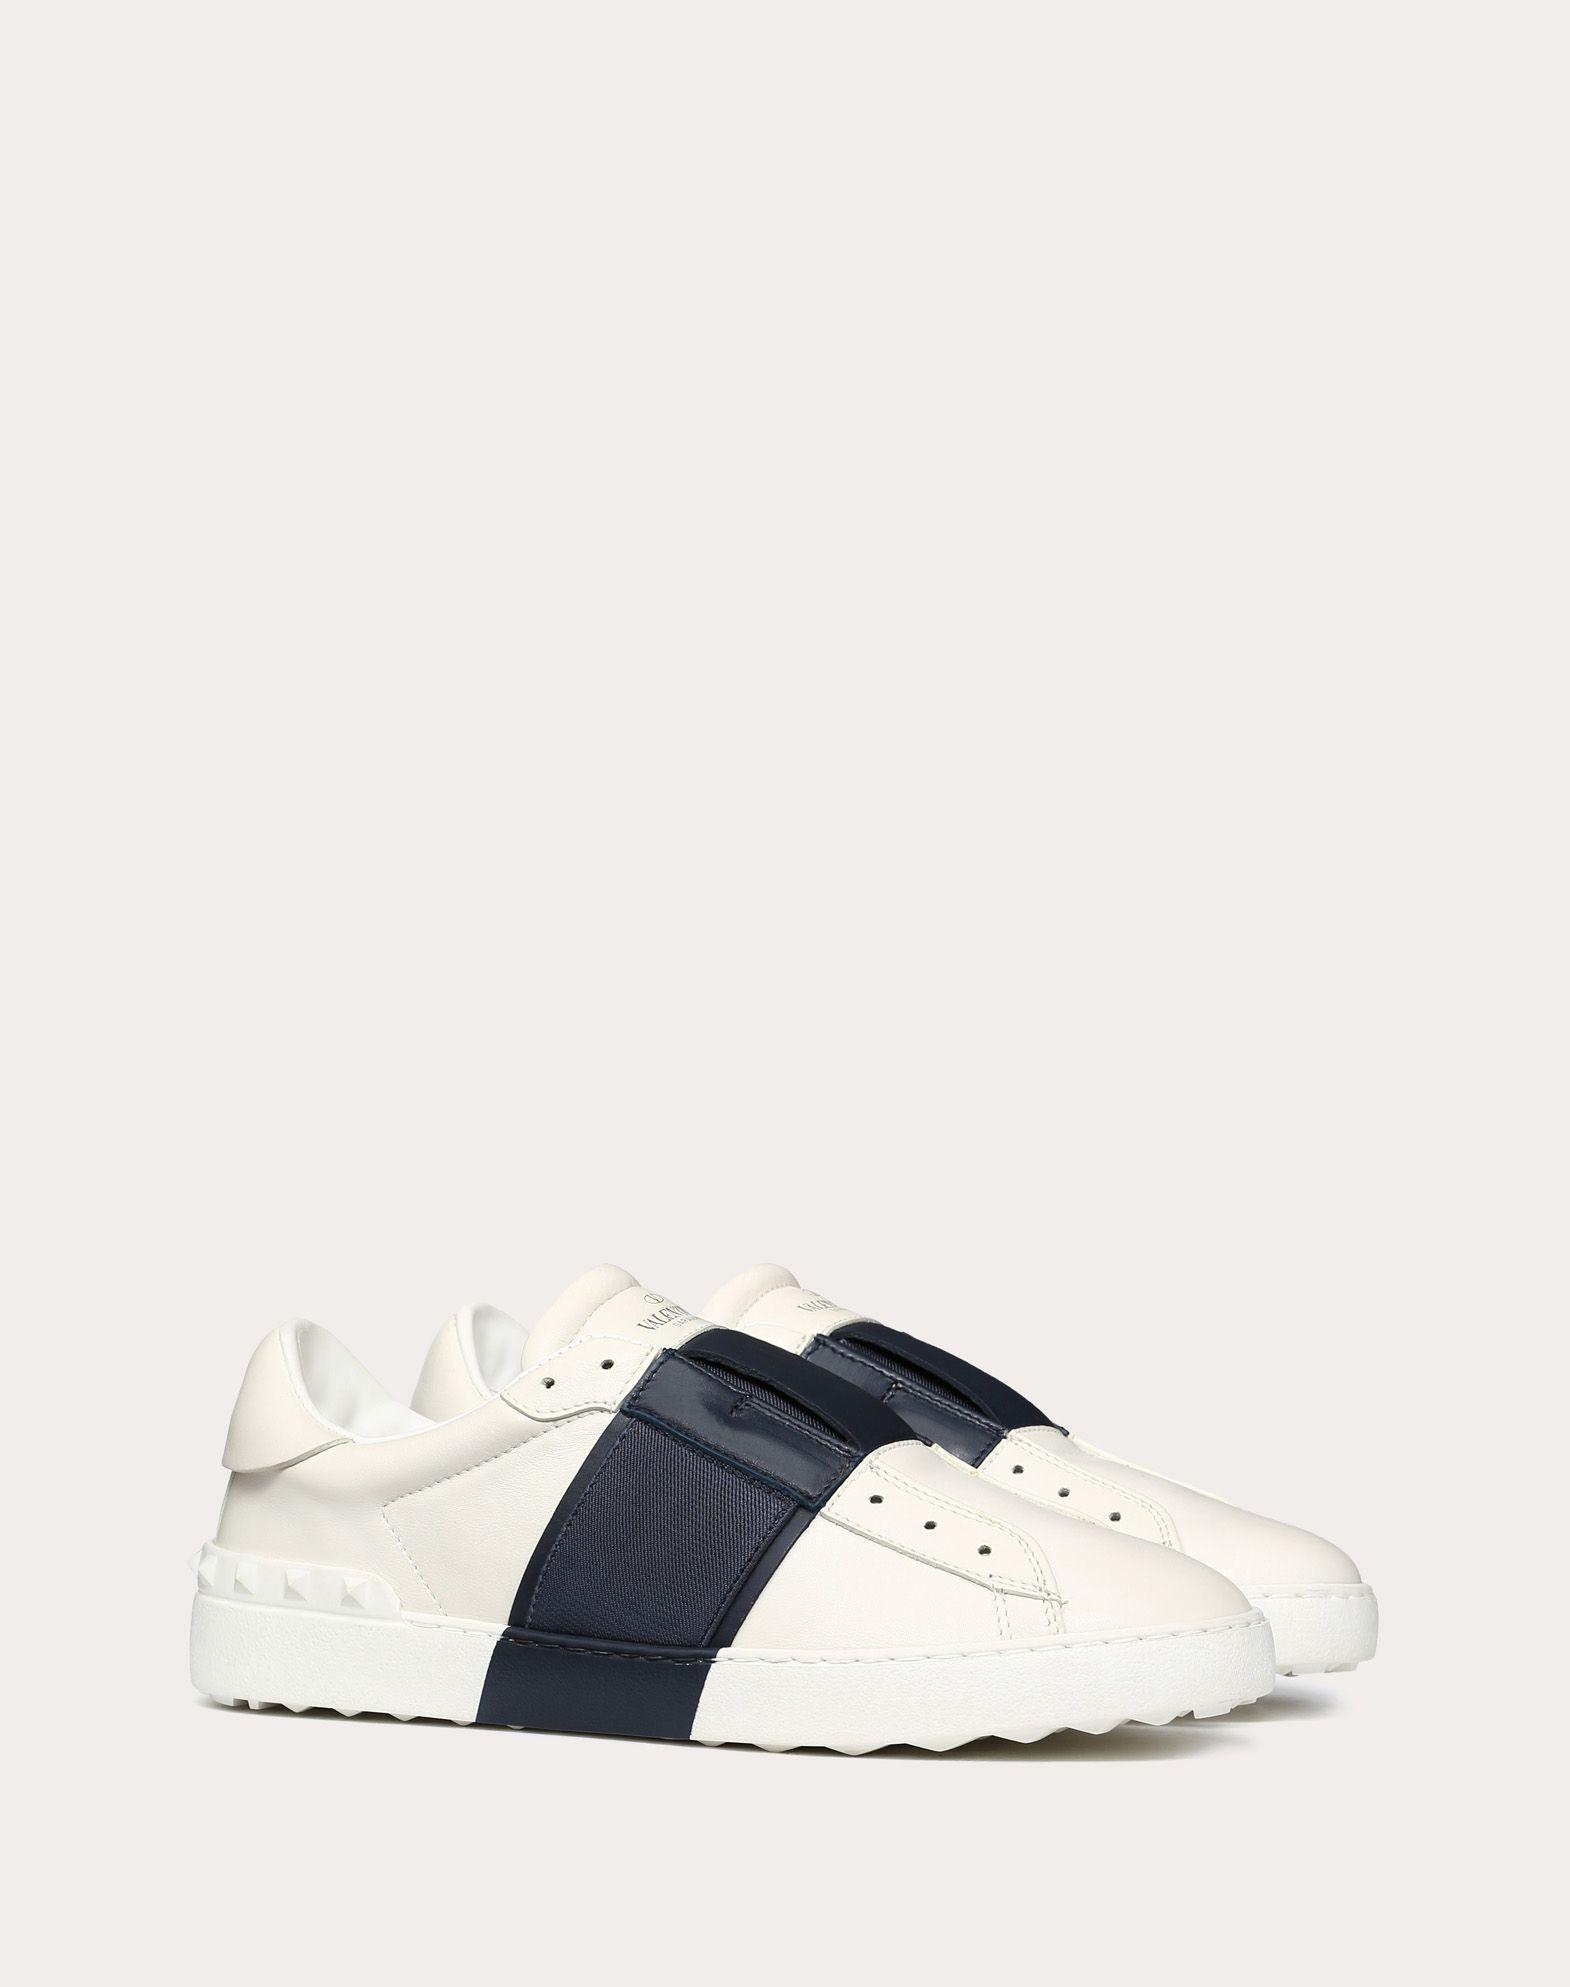 VALENTINO GARAVANI UOMO Elastic Sneaker LOW-TOP SNEAKERS U r